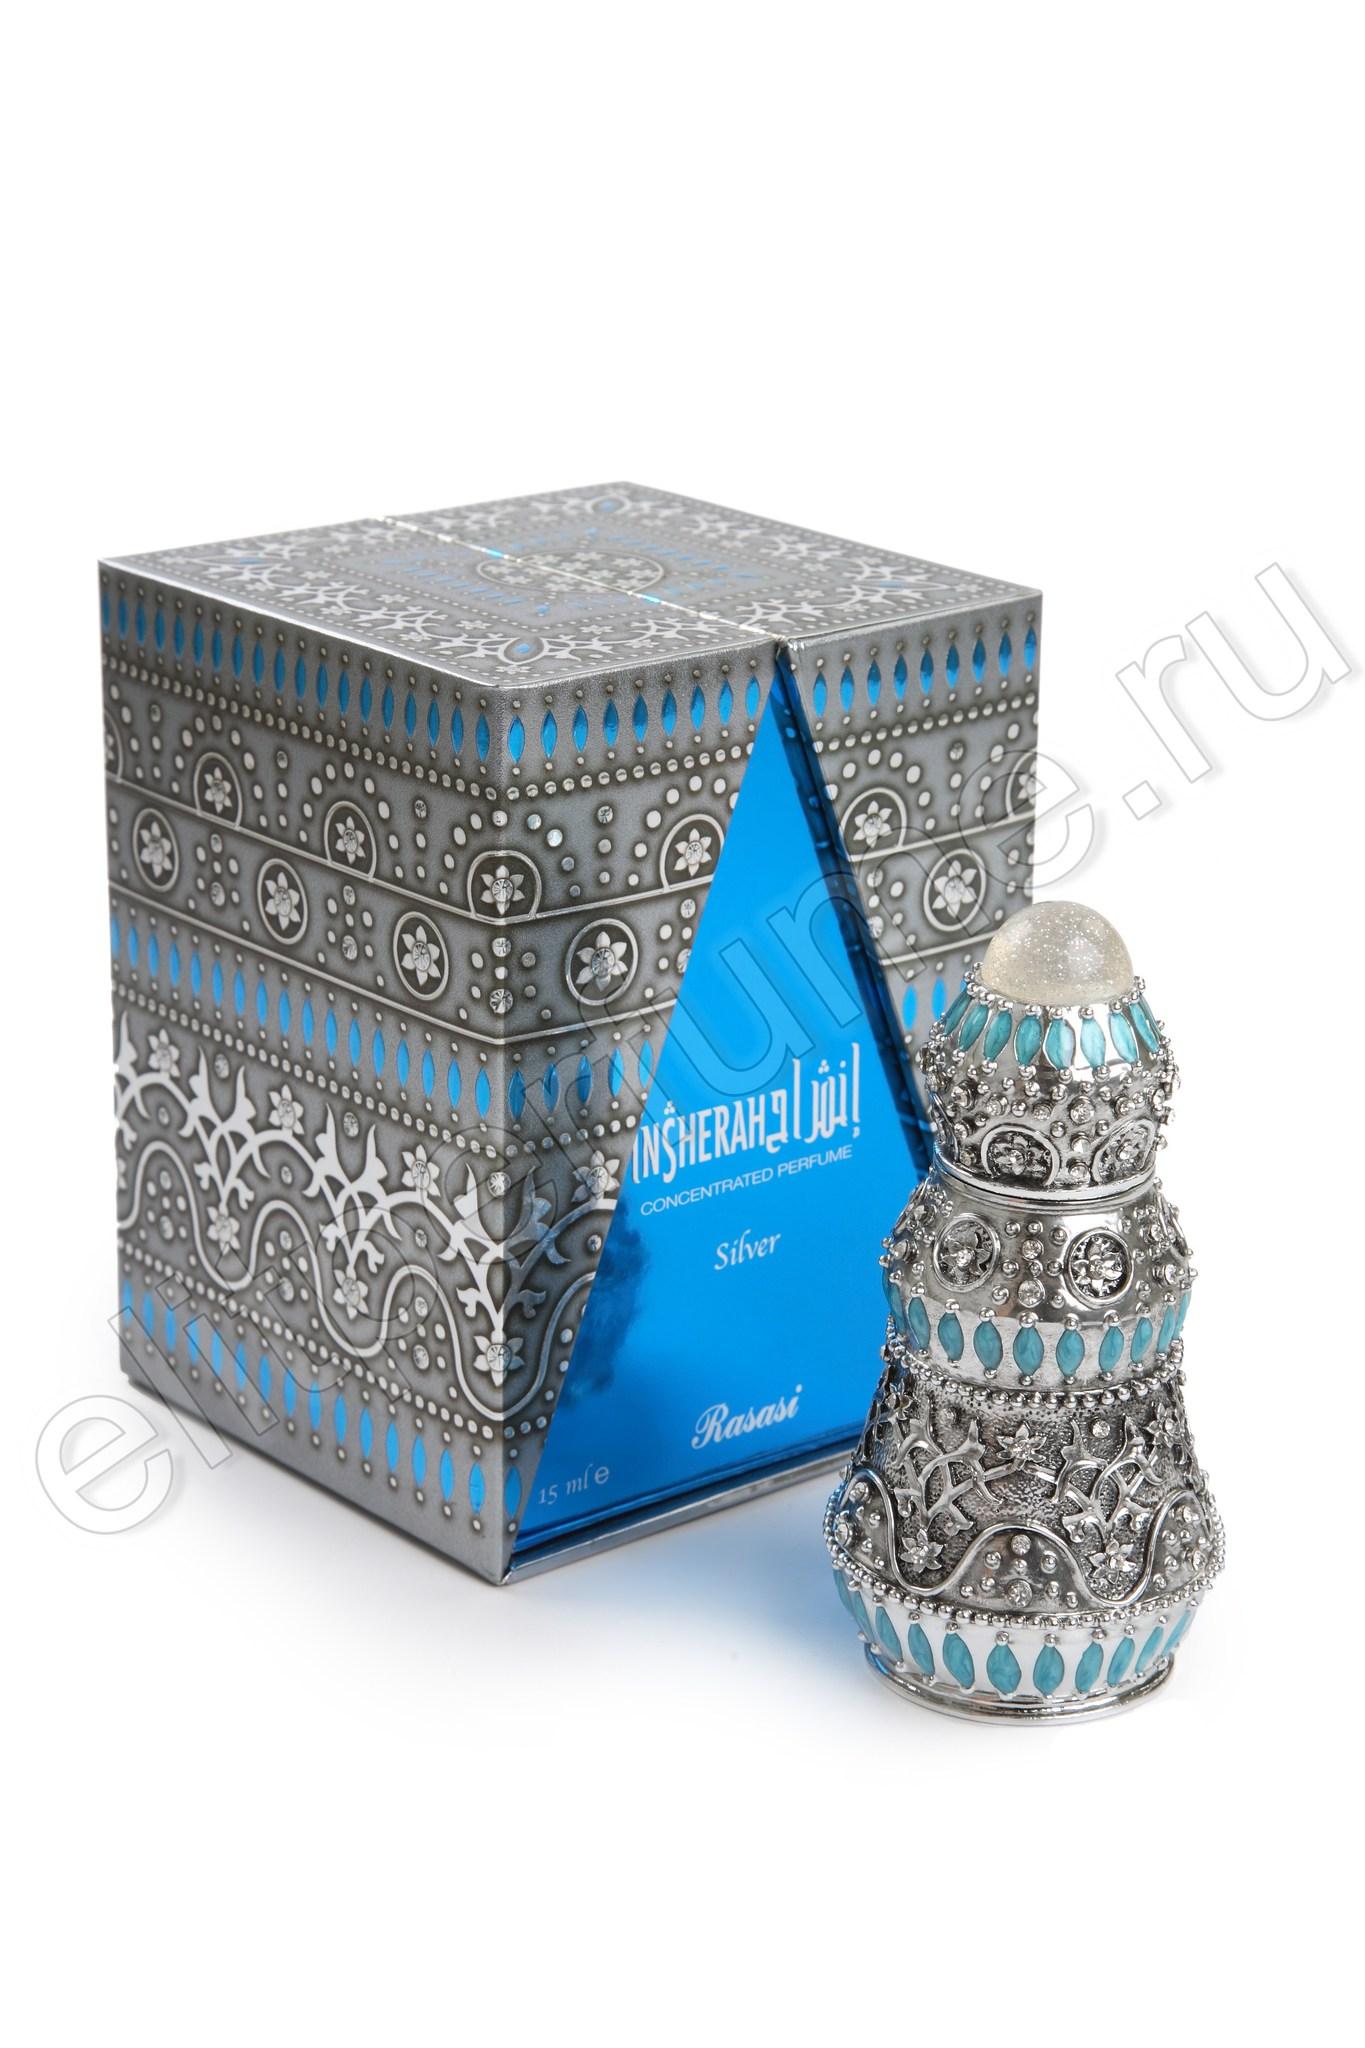 Иншера Серебро Insherah Silver 15 мл арабские масляные духи от Расаси Rasasi Perfumes